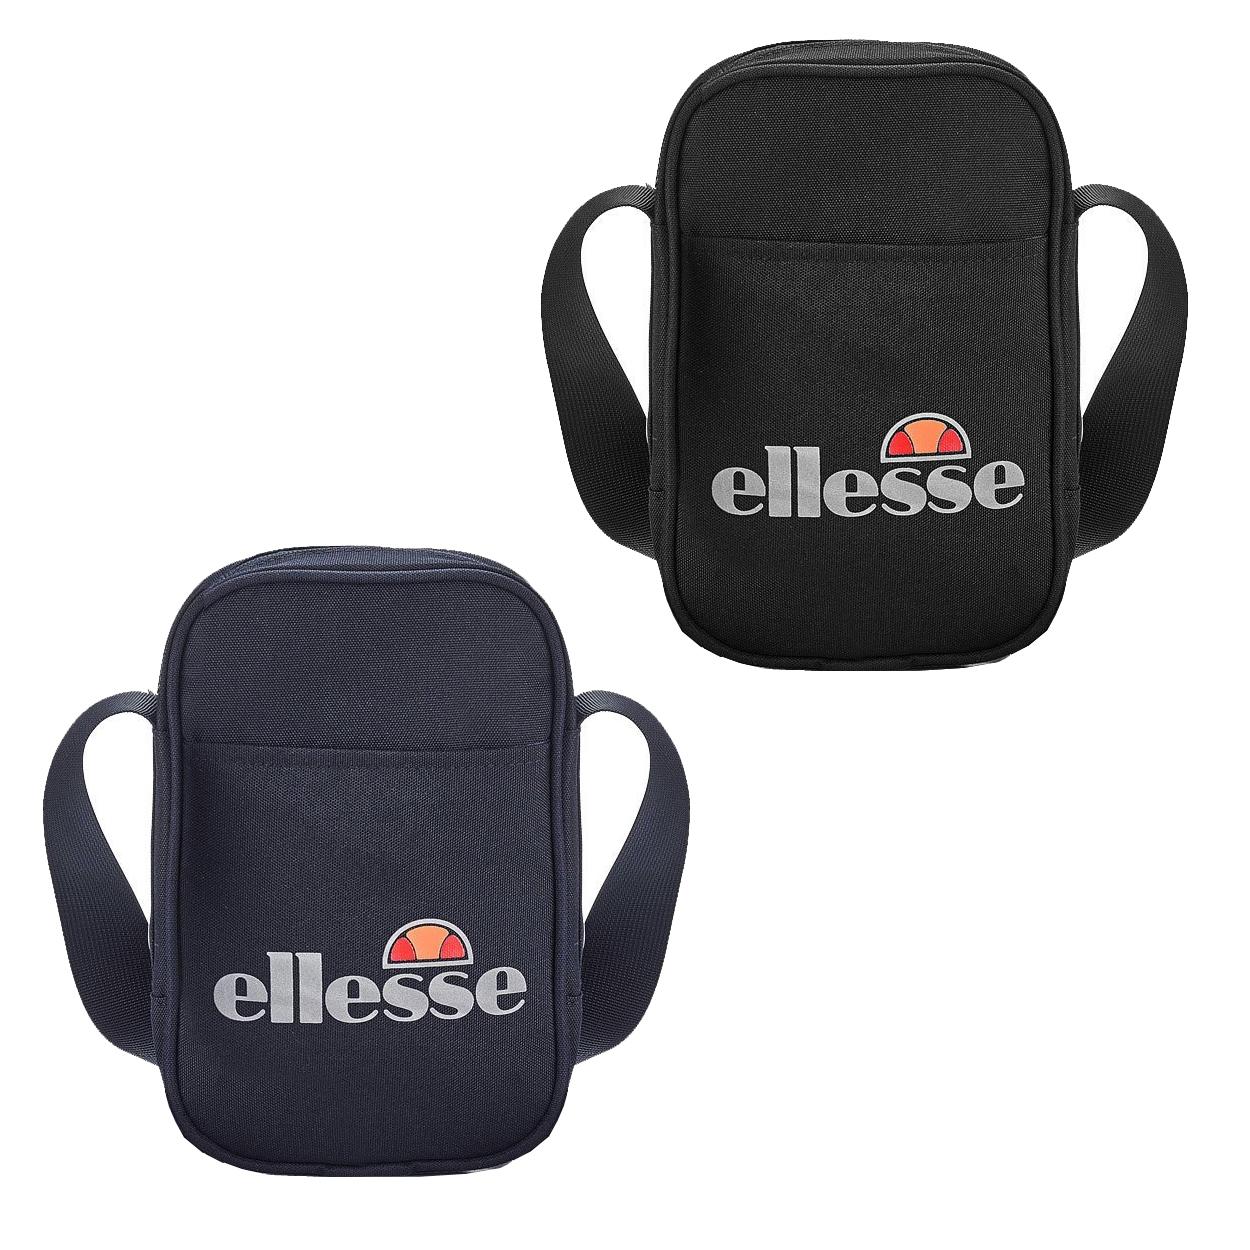 e0db3d0e40 Details about Ellesse Sport Reiz Small Items Cross Body Shoulder Man Bag